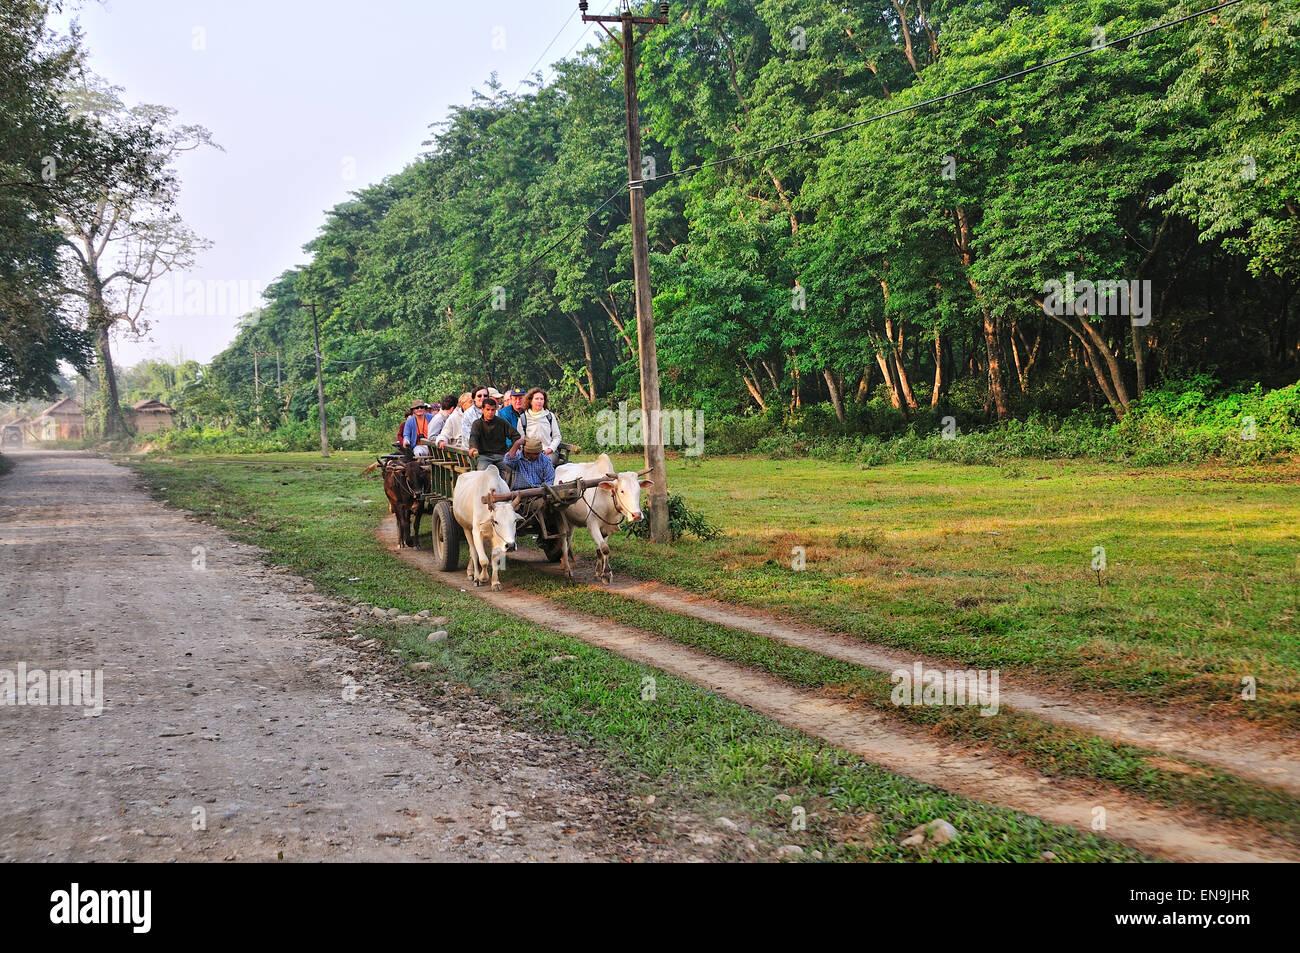 Chitwan National park, Chitwan, Nepal. - Stock Image